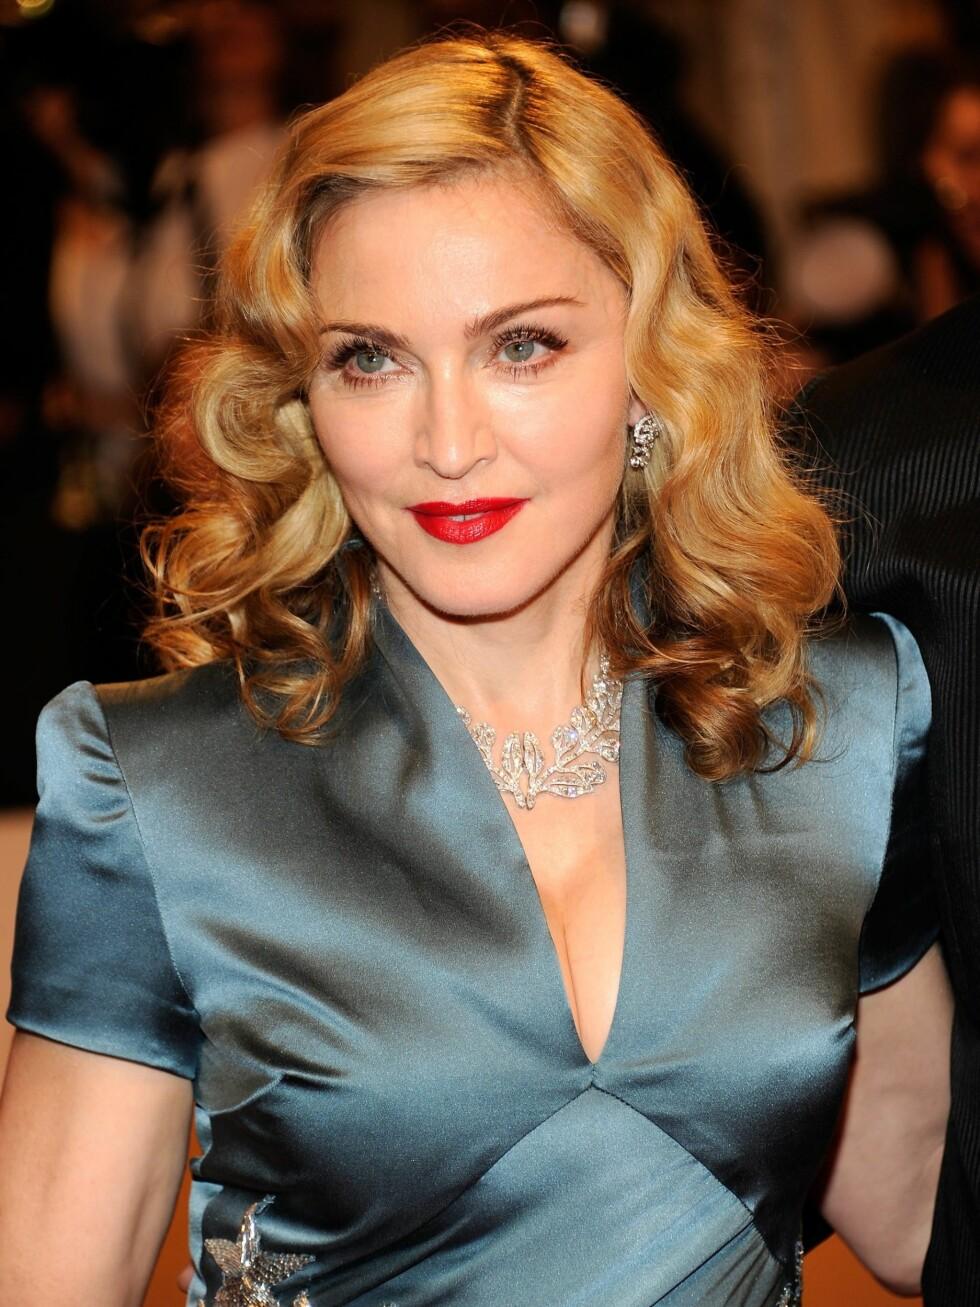 Klassisk sminke og hollywoodbølger i håret sto godt til den glamorøse kjolen og de delikate smykkene. Foto: All Over Press